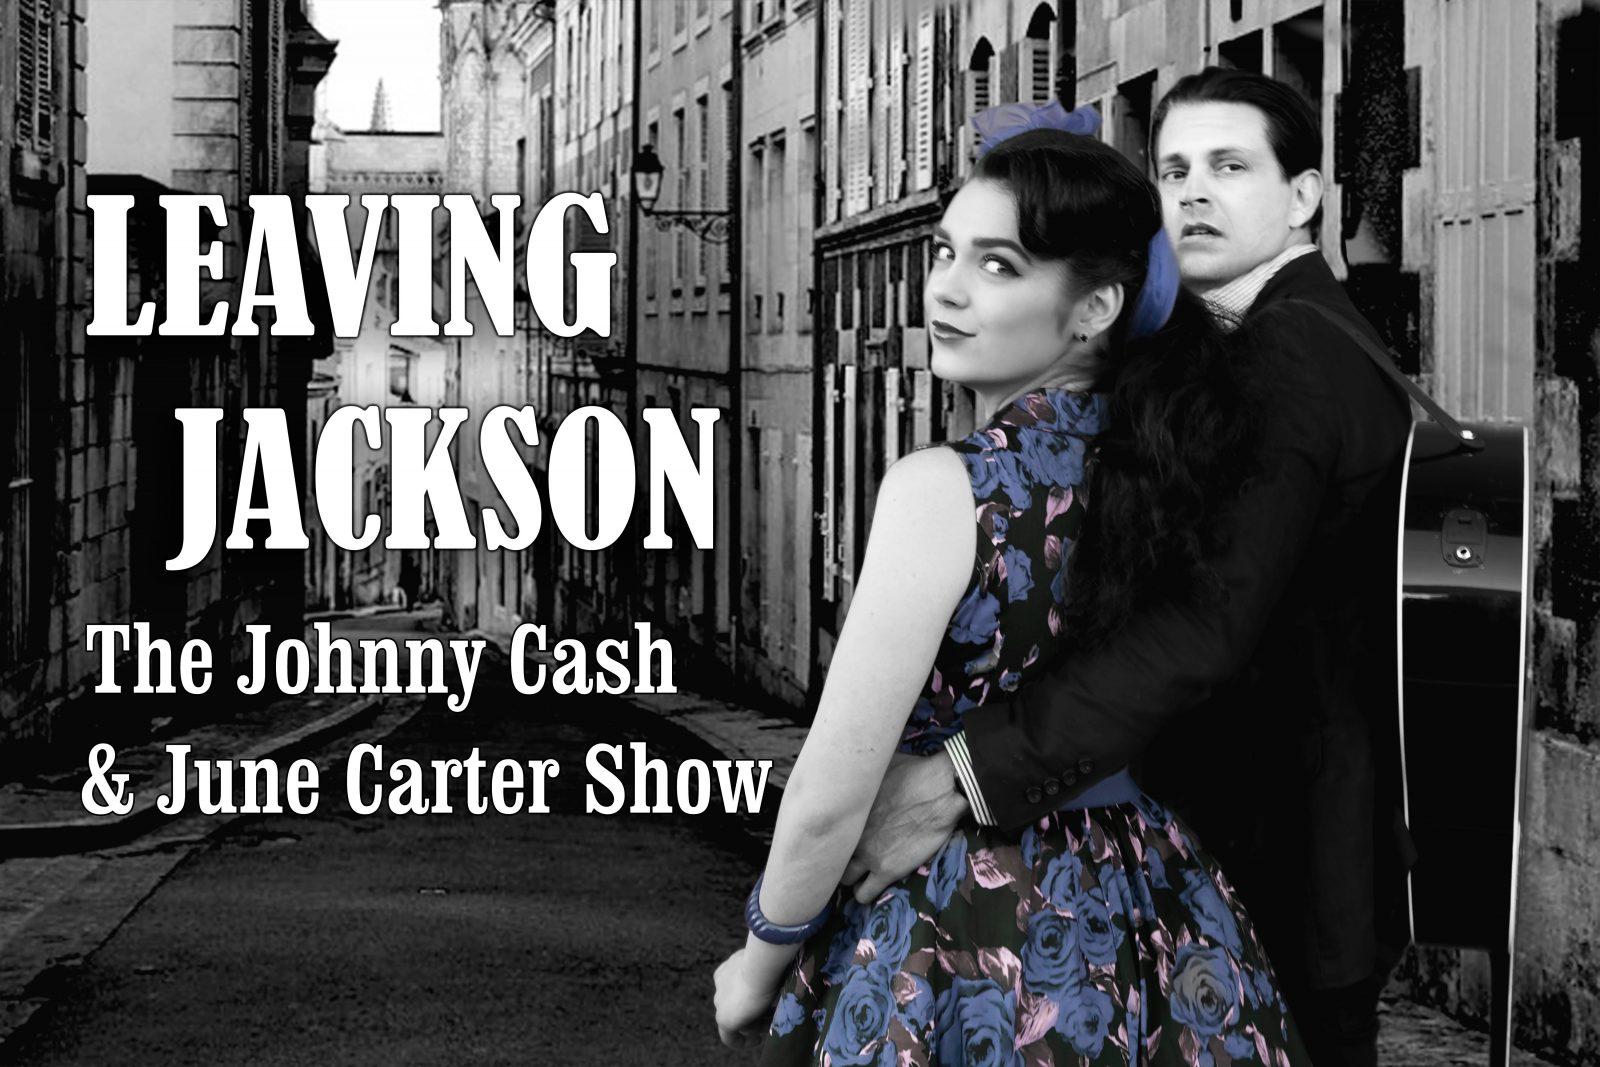 Leaving Jackson - The Johnny Cash & June Carter Show